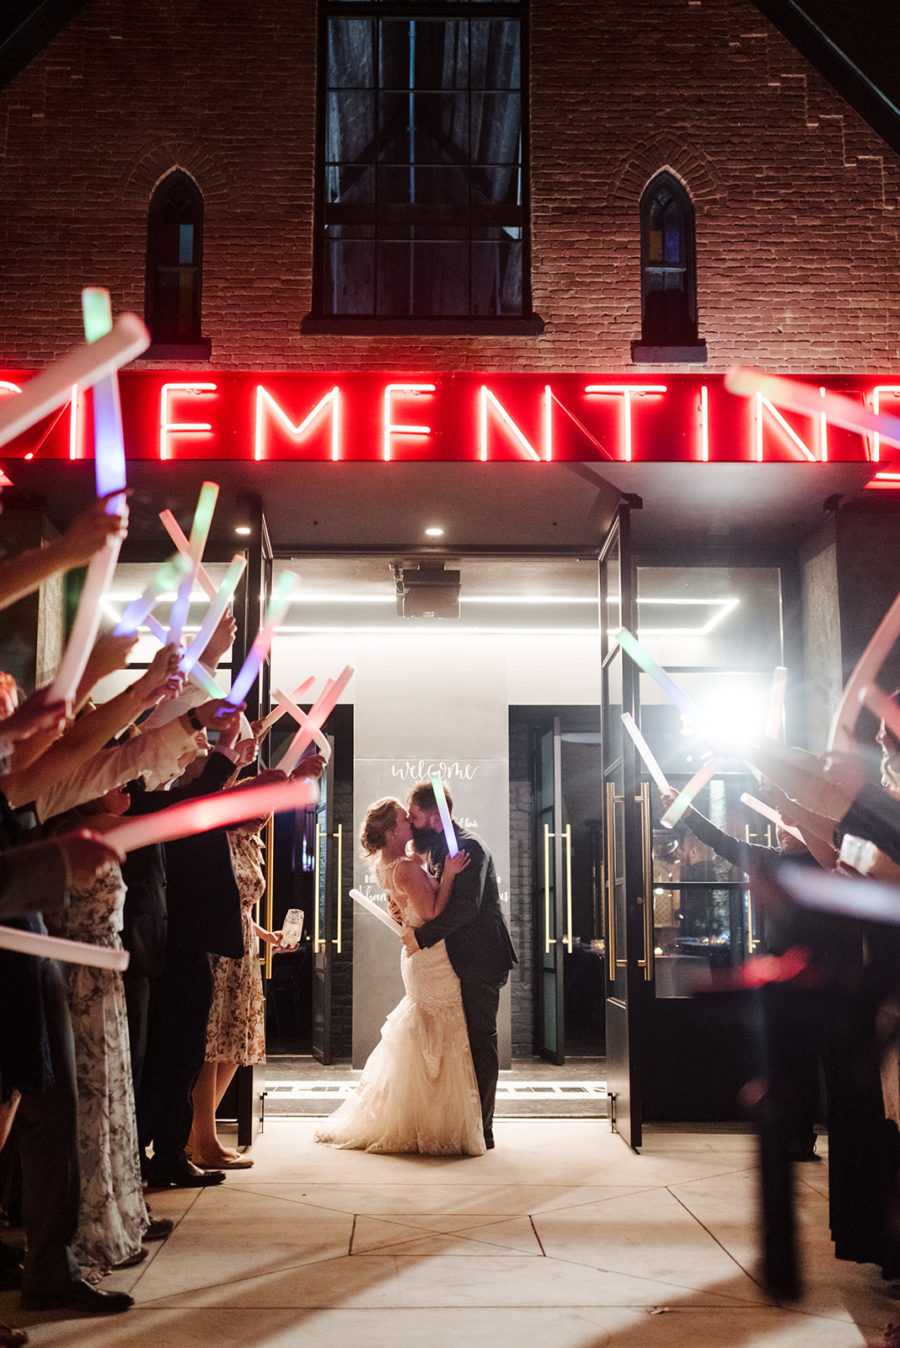 Wedding exit photography: Nashville wedding at Clementine featured on Nashville Bride Guide